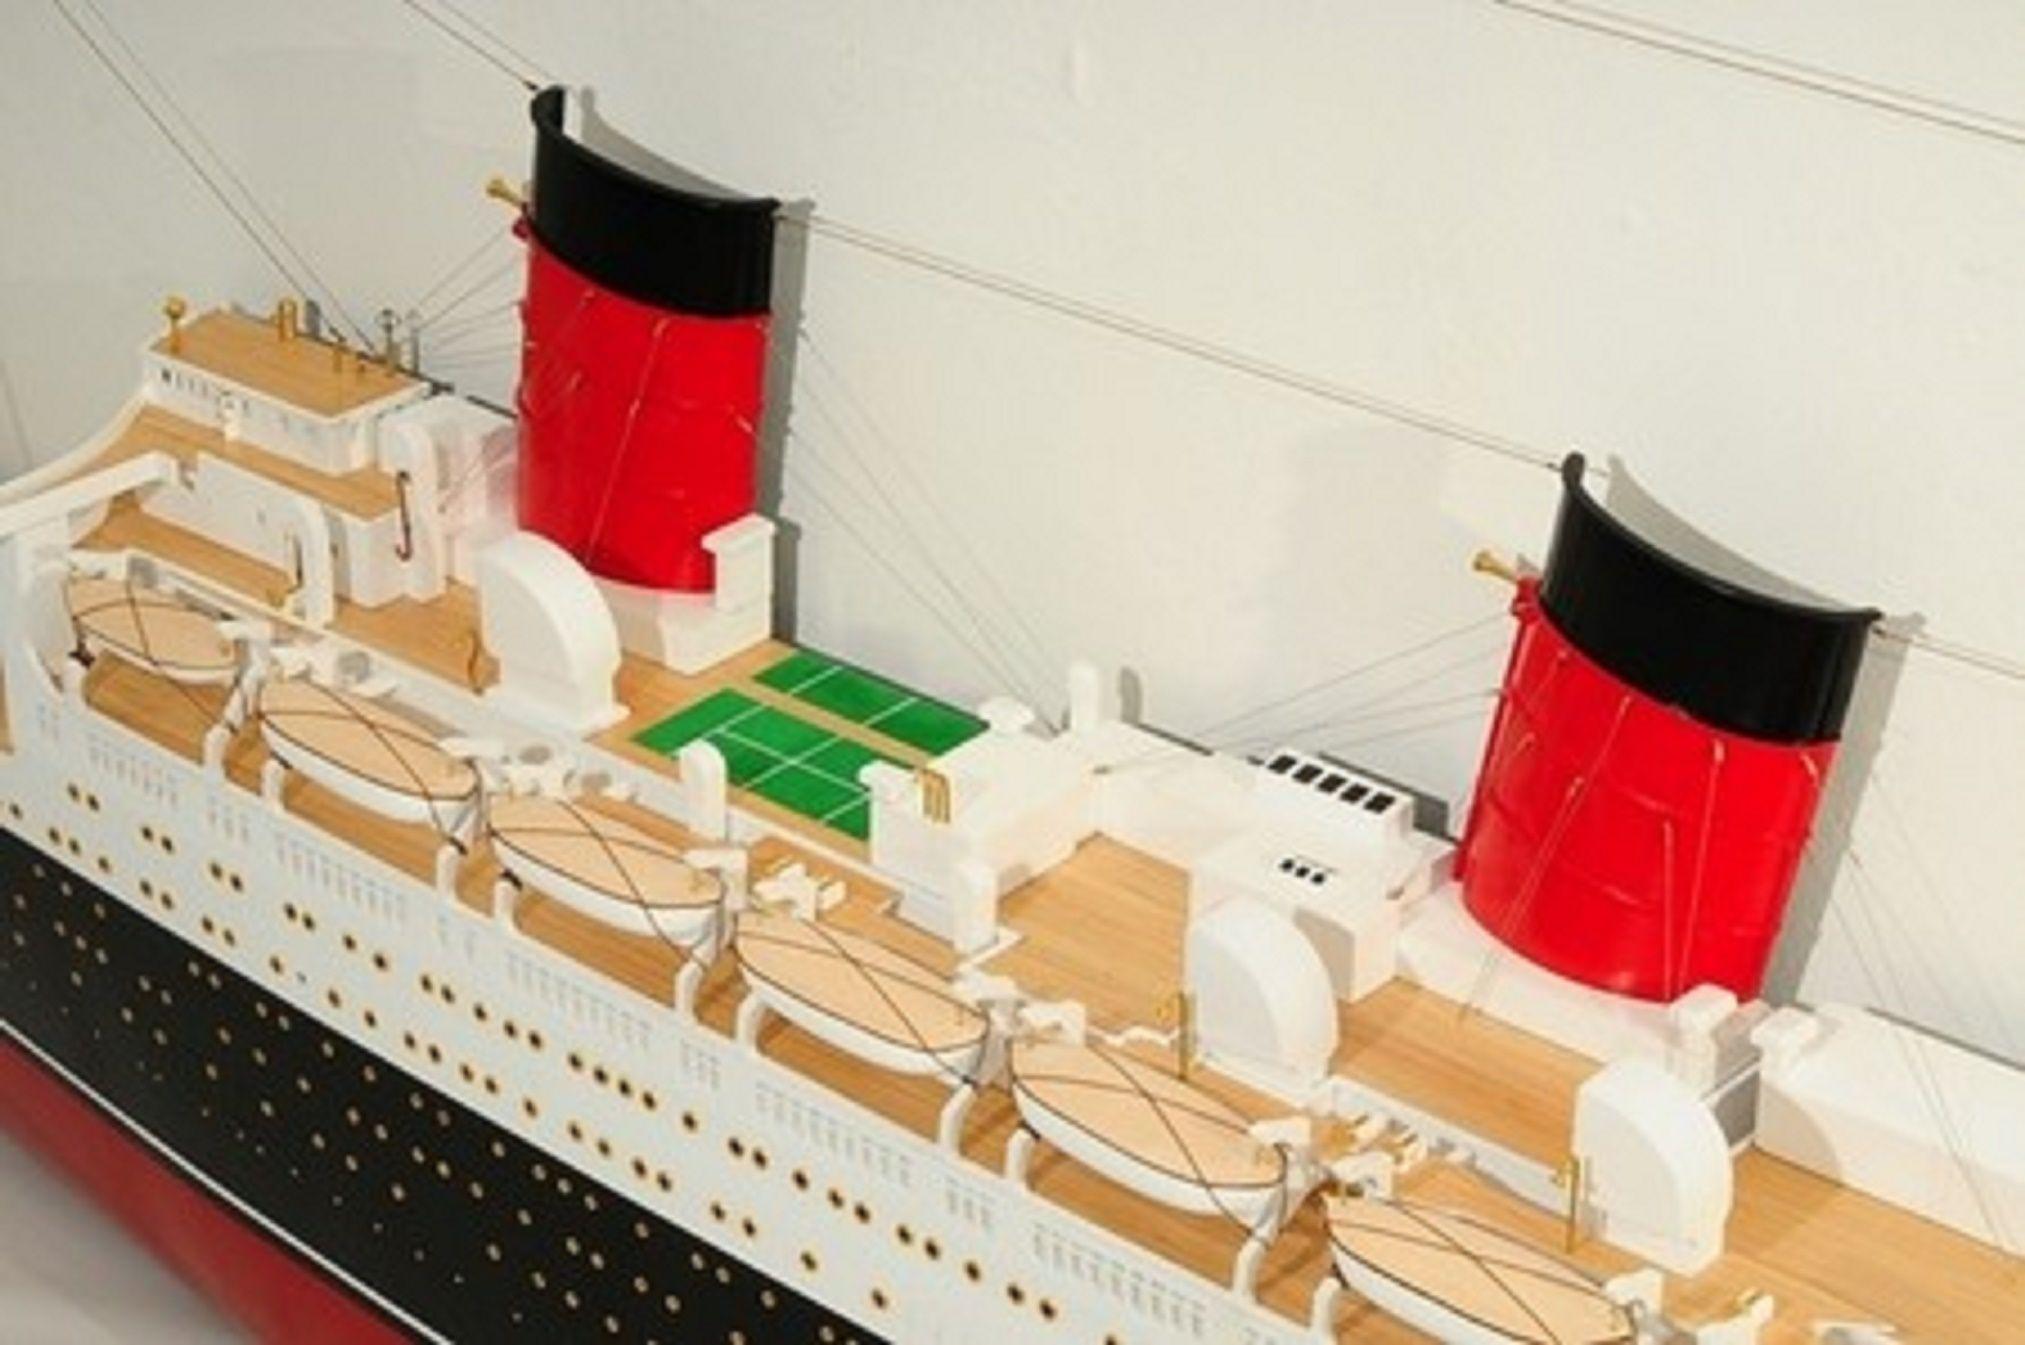 670-7592-RMS-Queen-Mary-Half-Model-Premier-Range